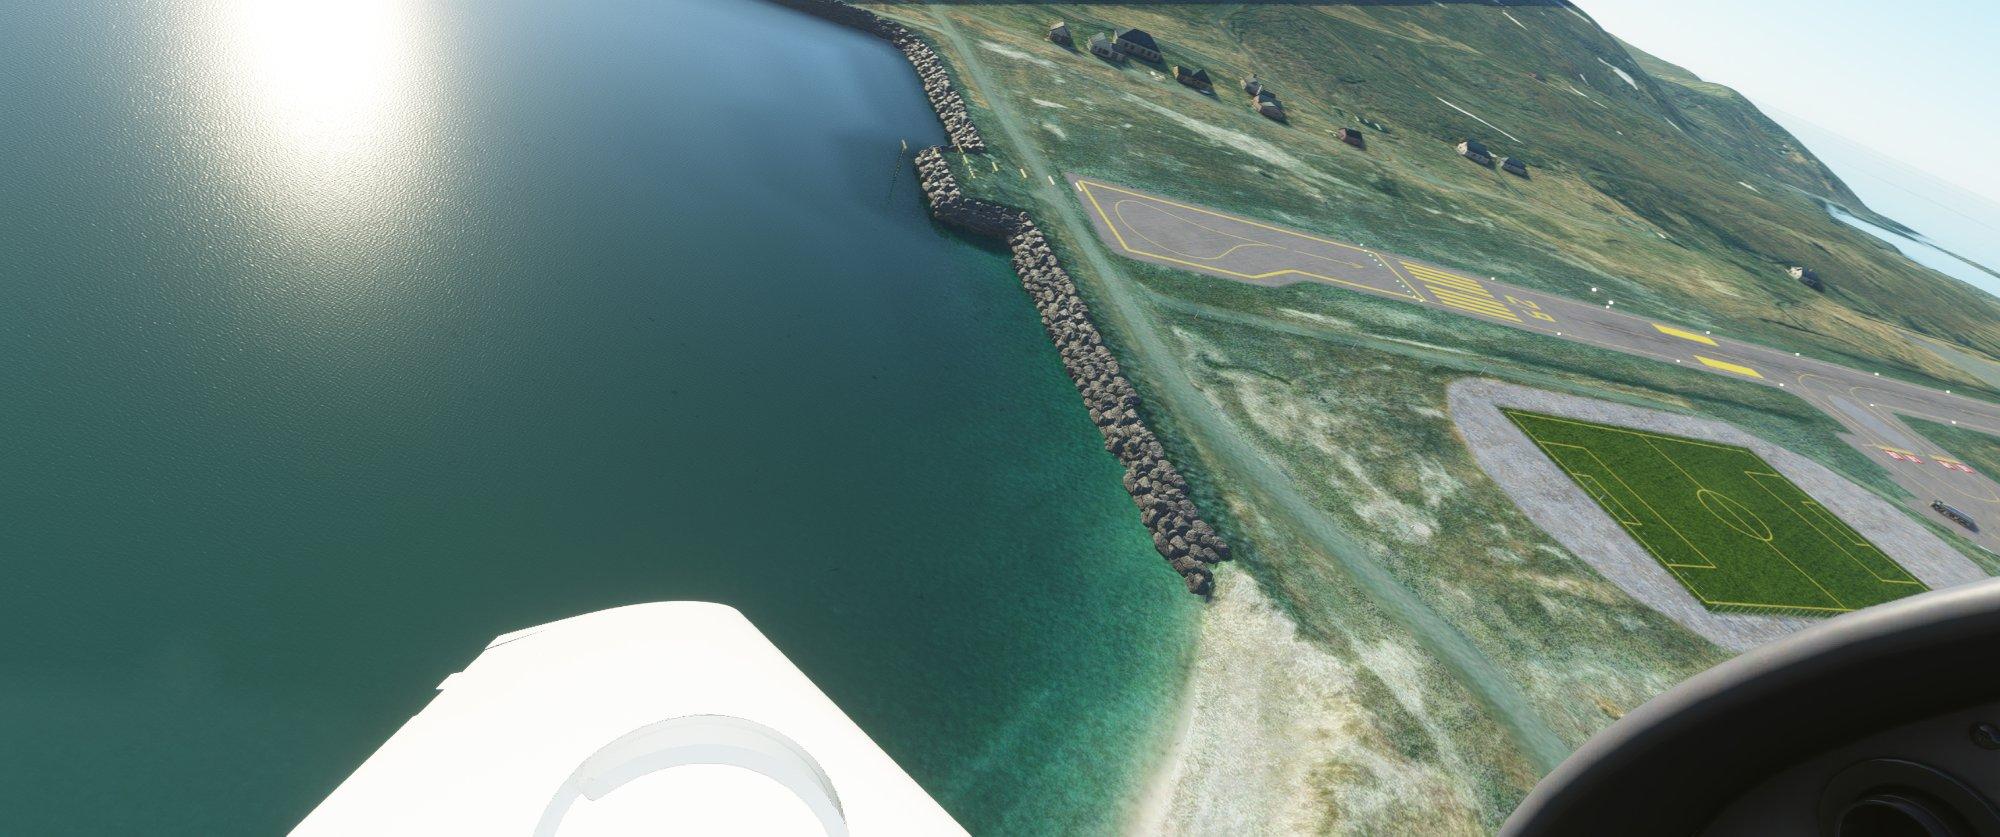 Microsoft Flight Simulator Screenshot 2020.11.20 - 13.00.03.45.jpg